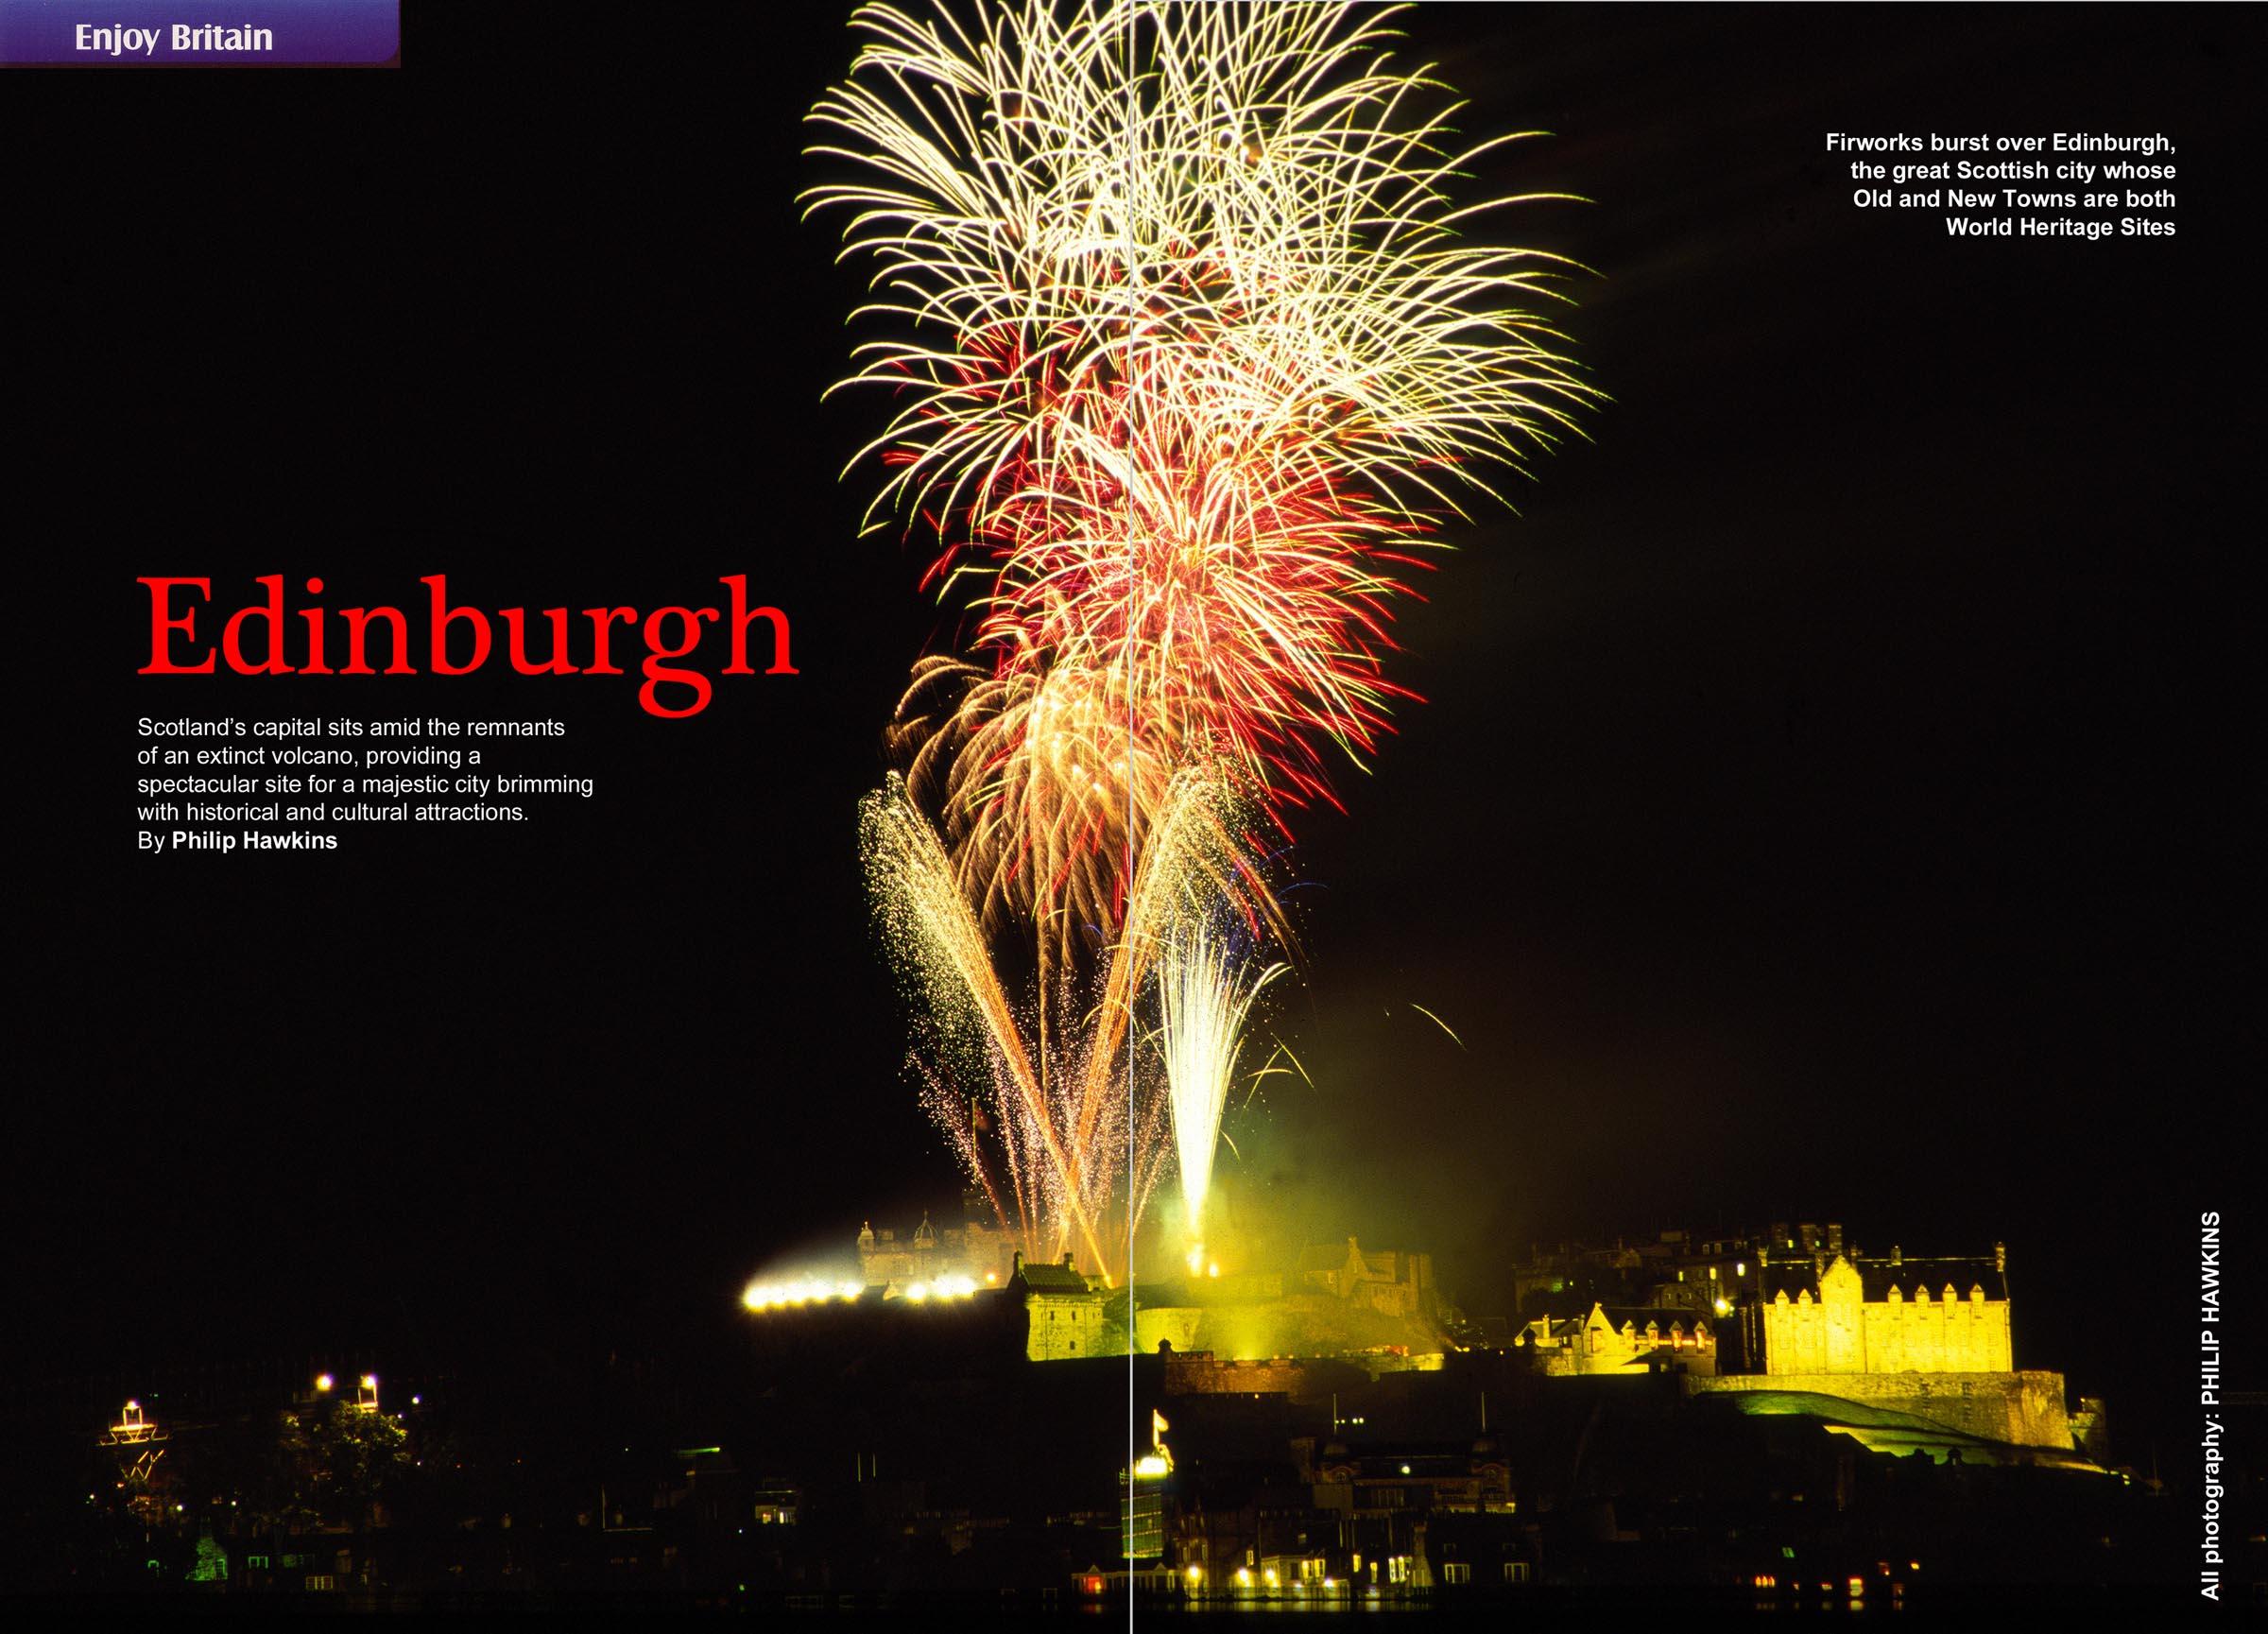 Edinburgh fireworks double page magazine spread